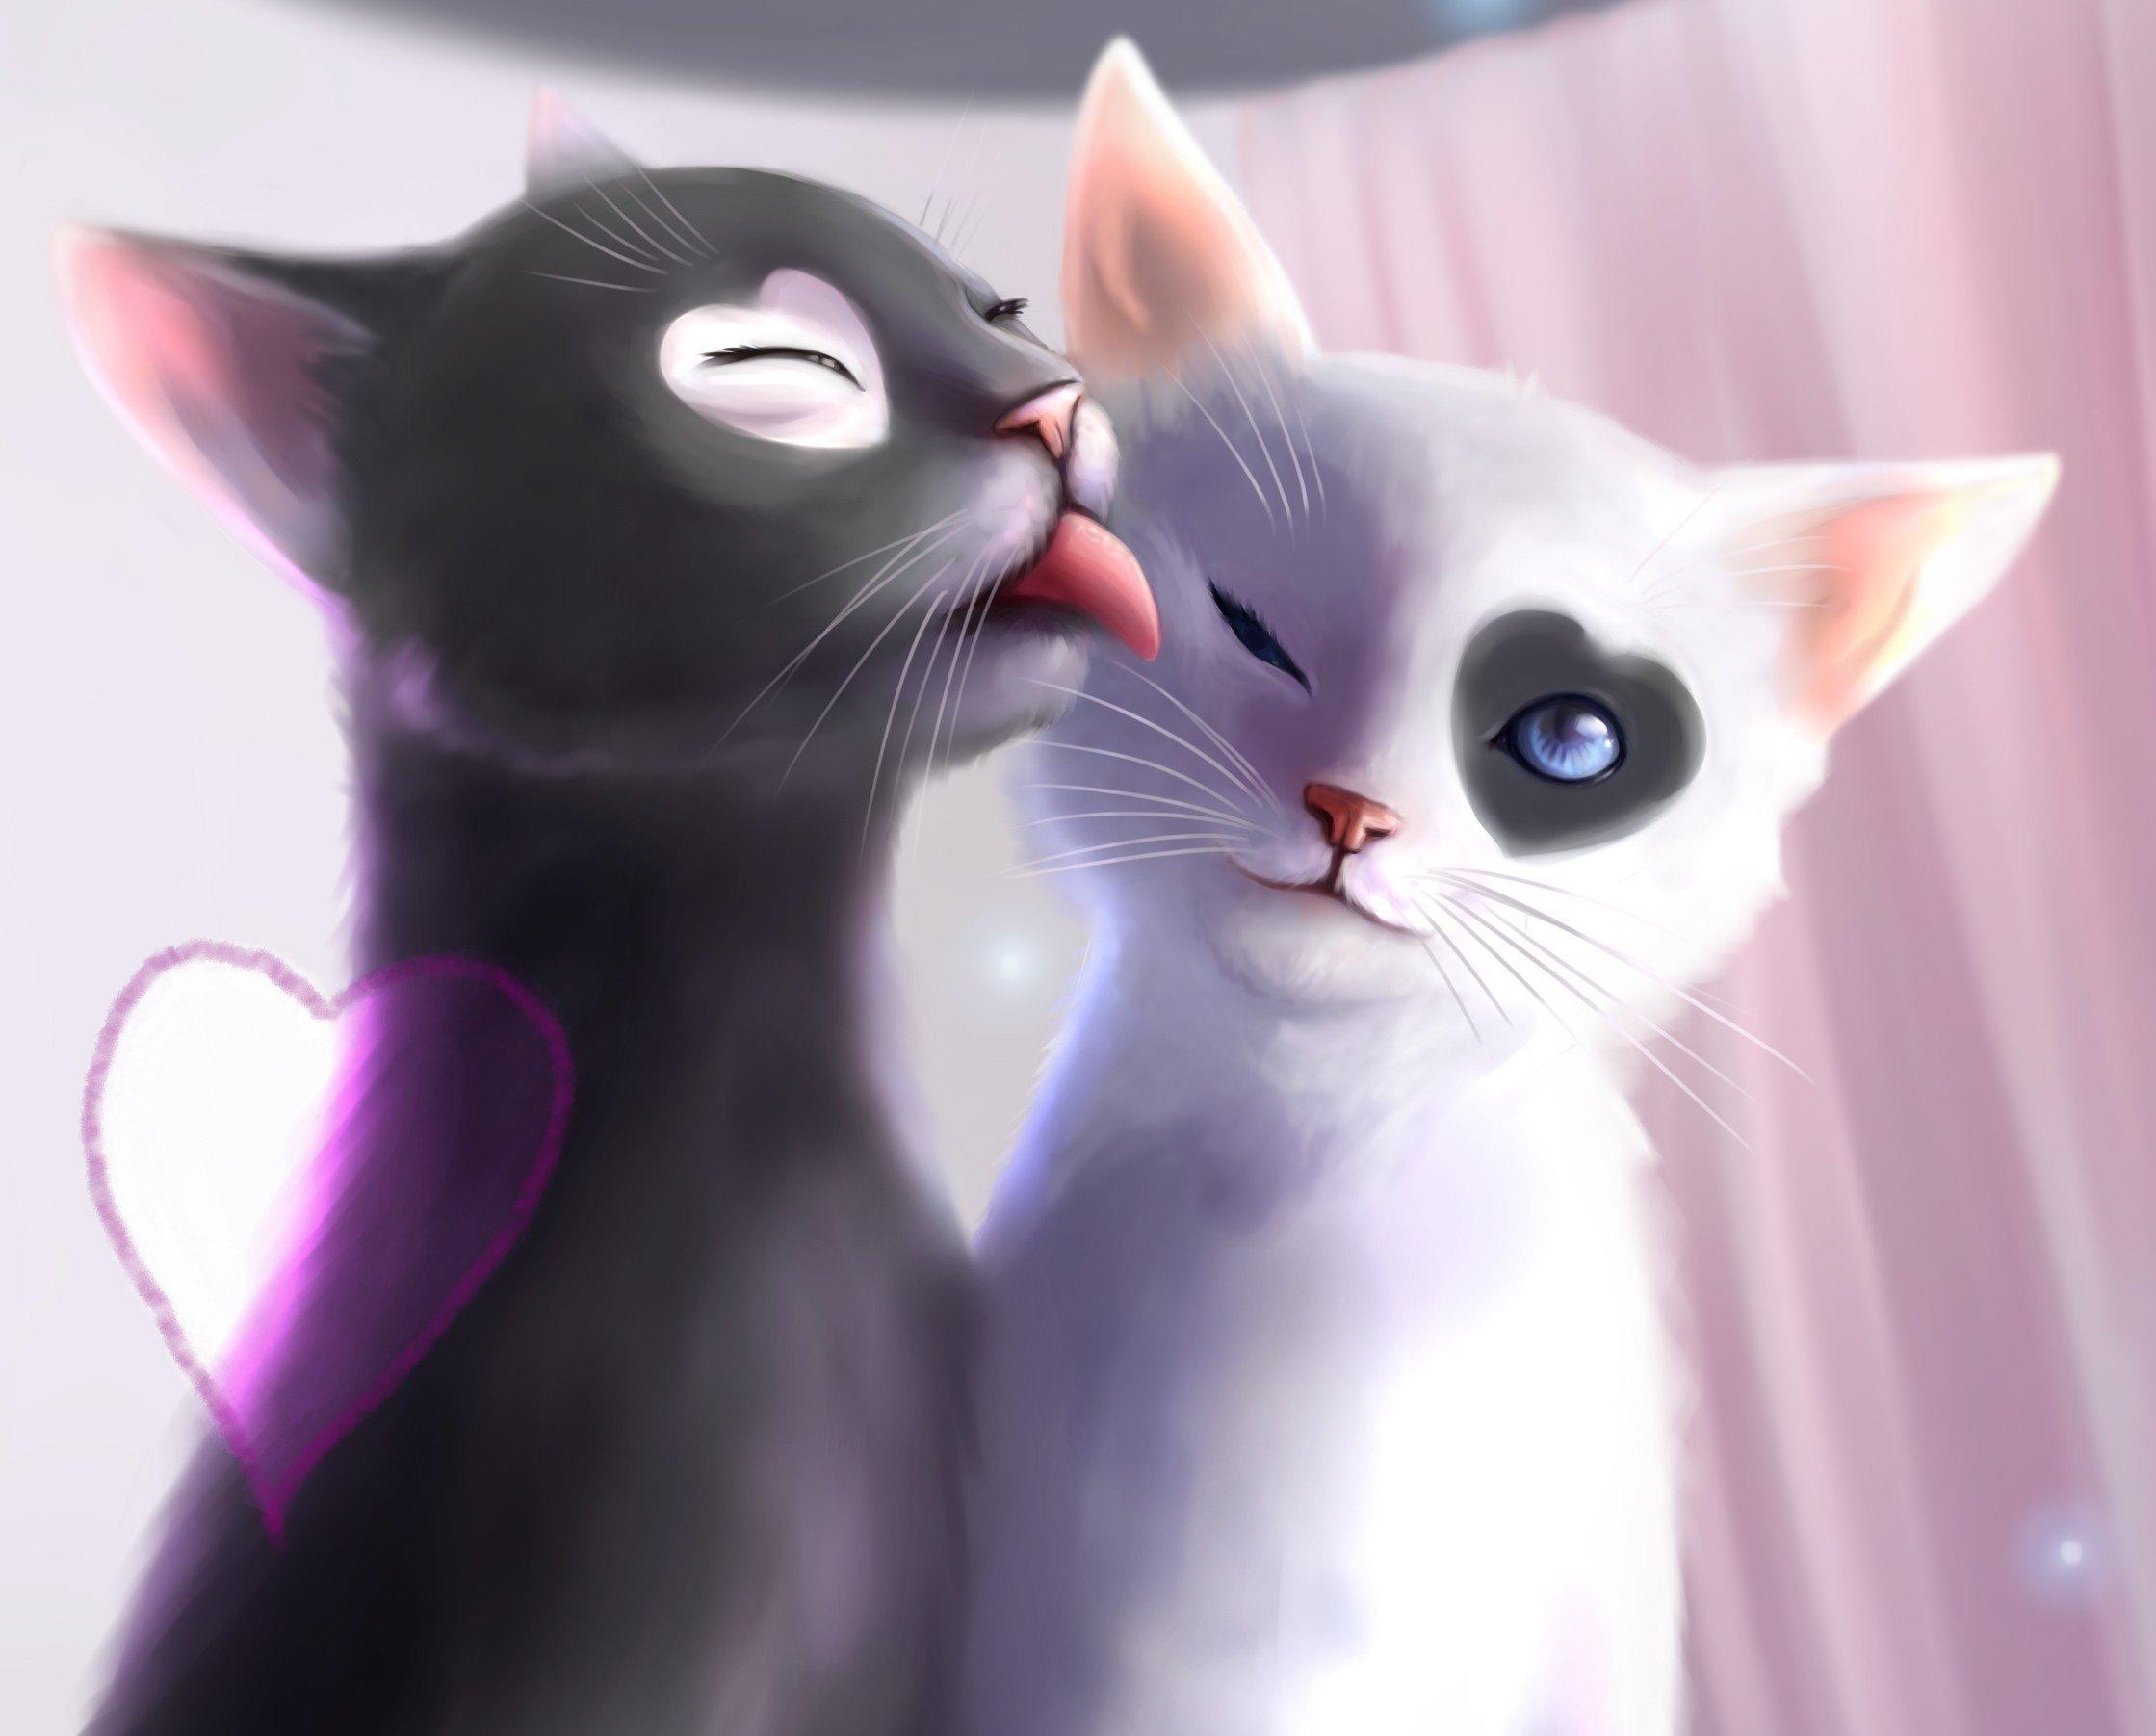 Love Wallpaper For chat : Language art cats love heart mood d wallpaper 2239x1803 356285 WallpaperUP